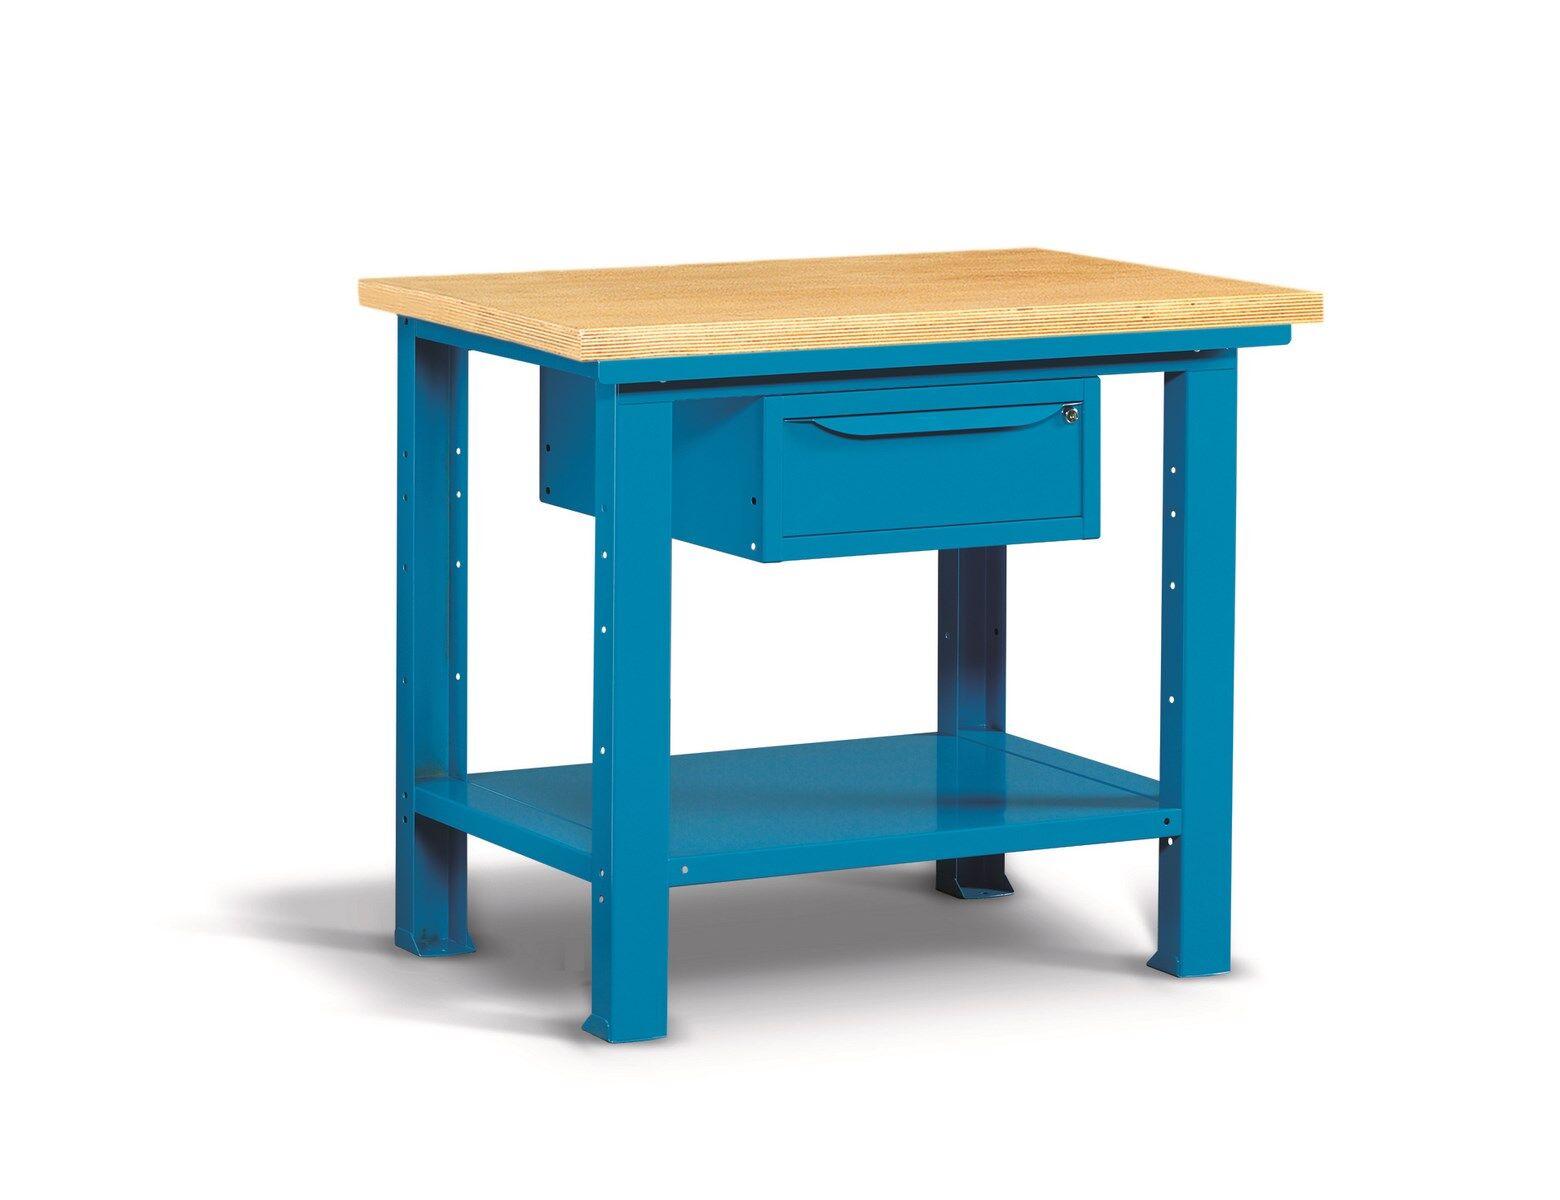 SETAM Etabli pro plateau bois et tiroir 1m